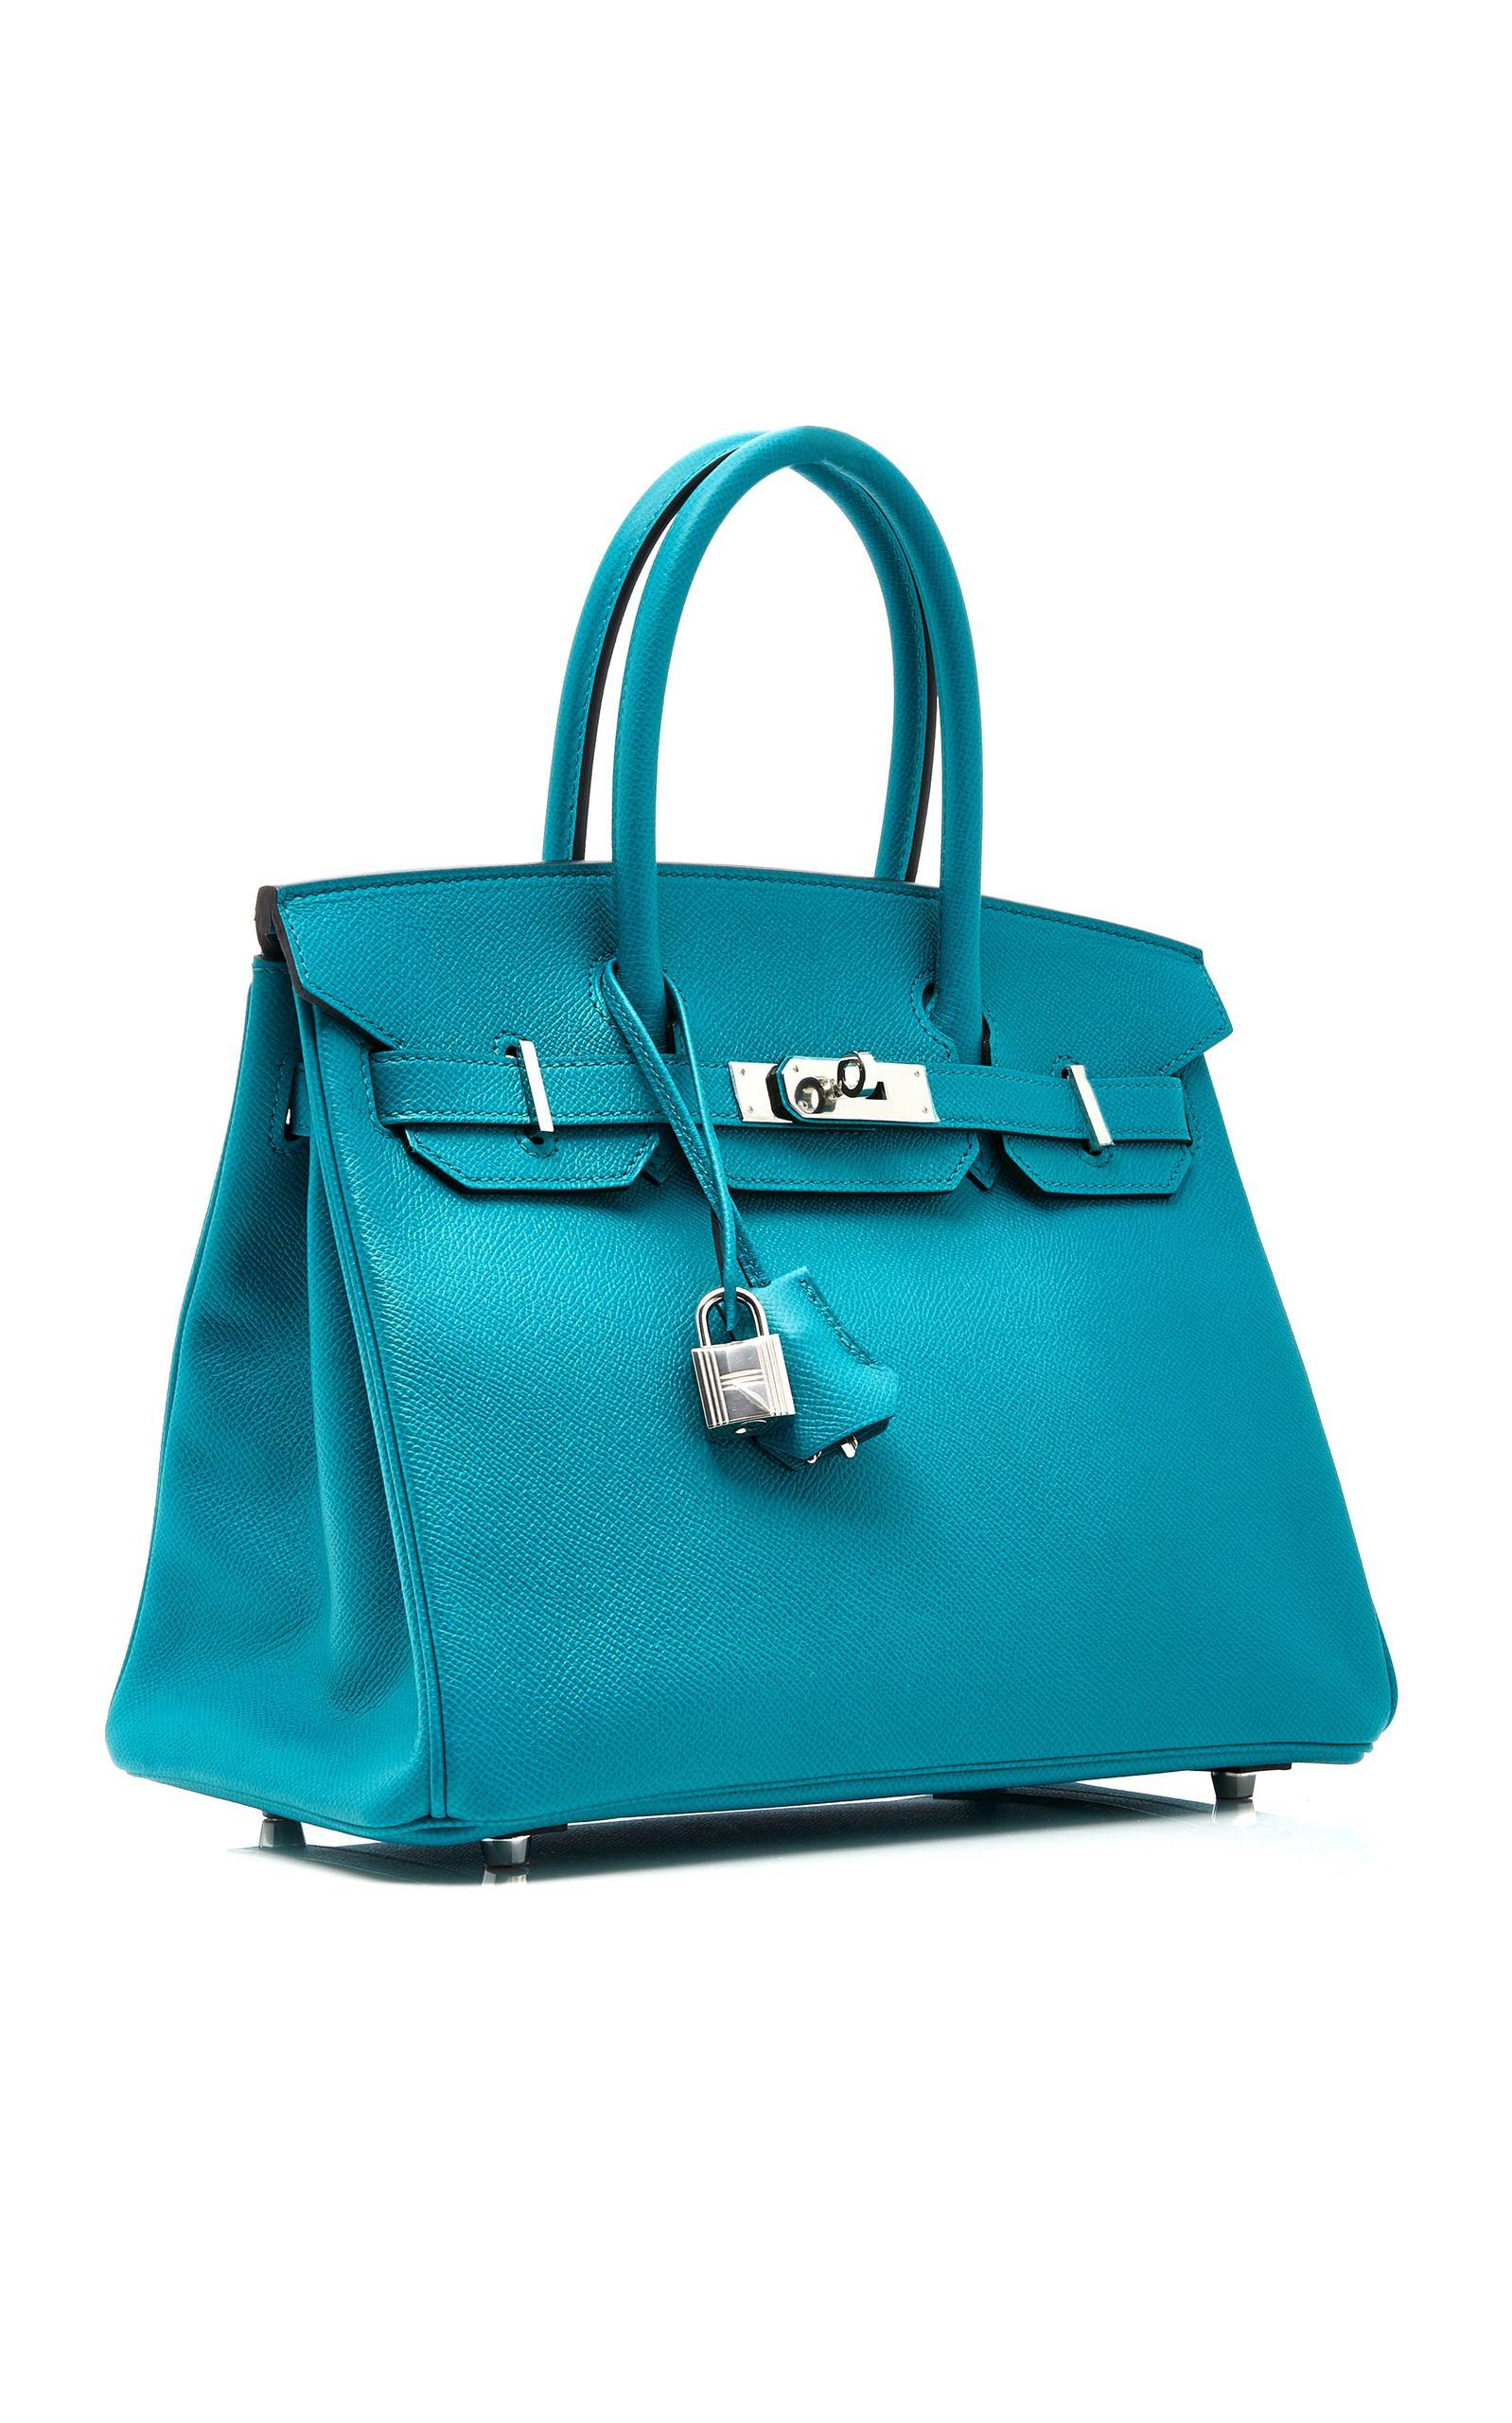 96668159c05 Hermes 30cm Blue Paon Epsom Birkin Carteira